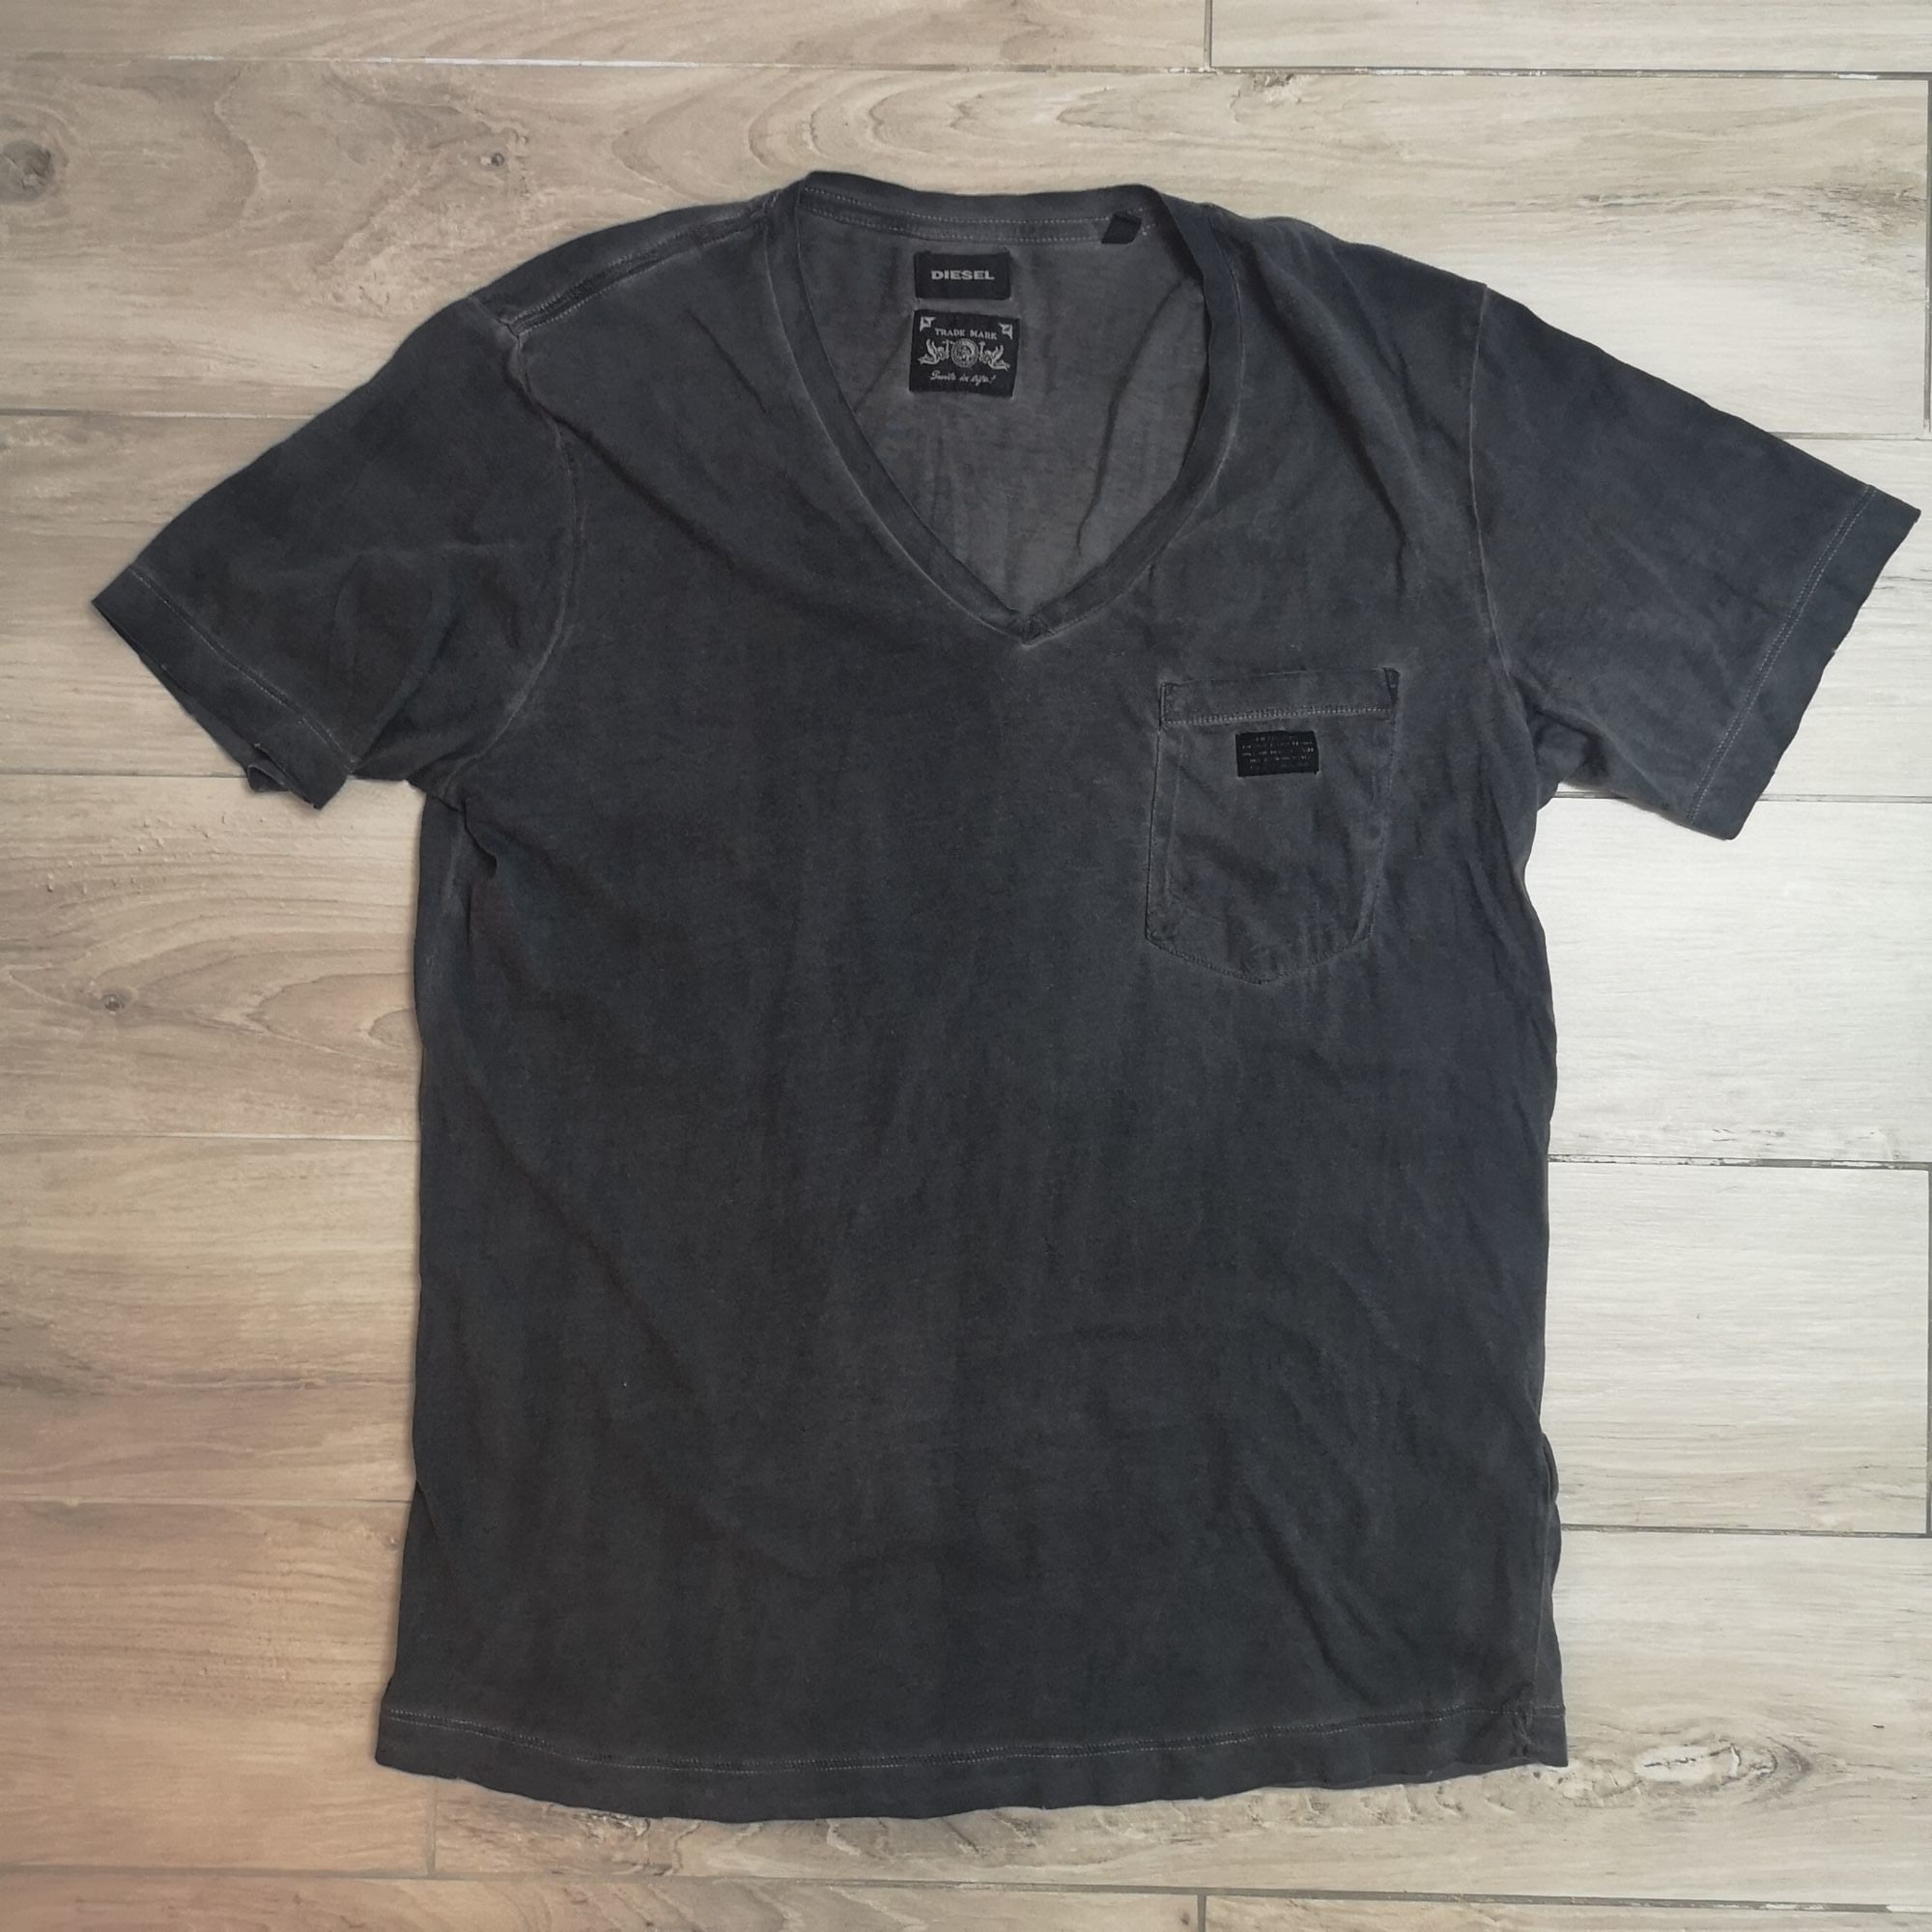 Tee-shirt DIESEL Gris, anthracite